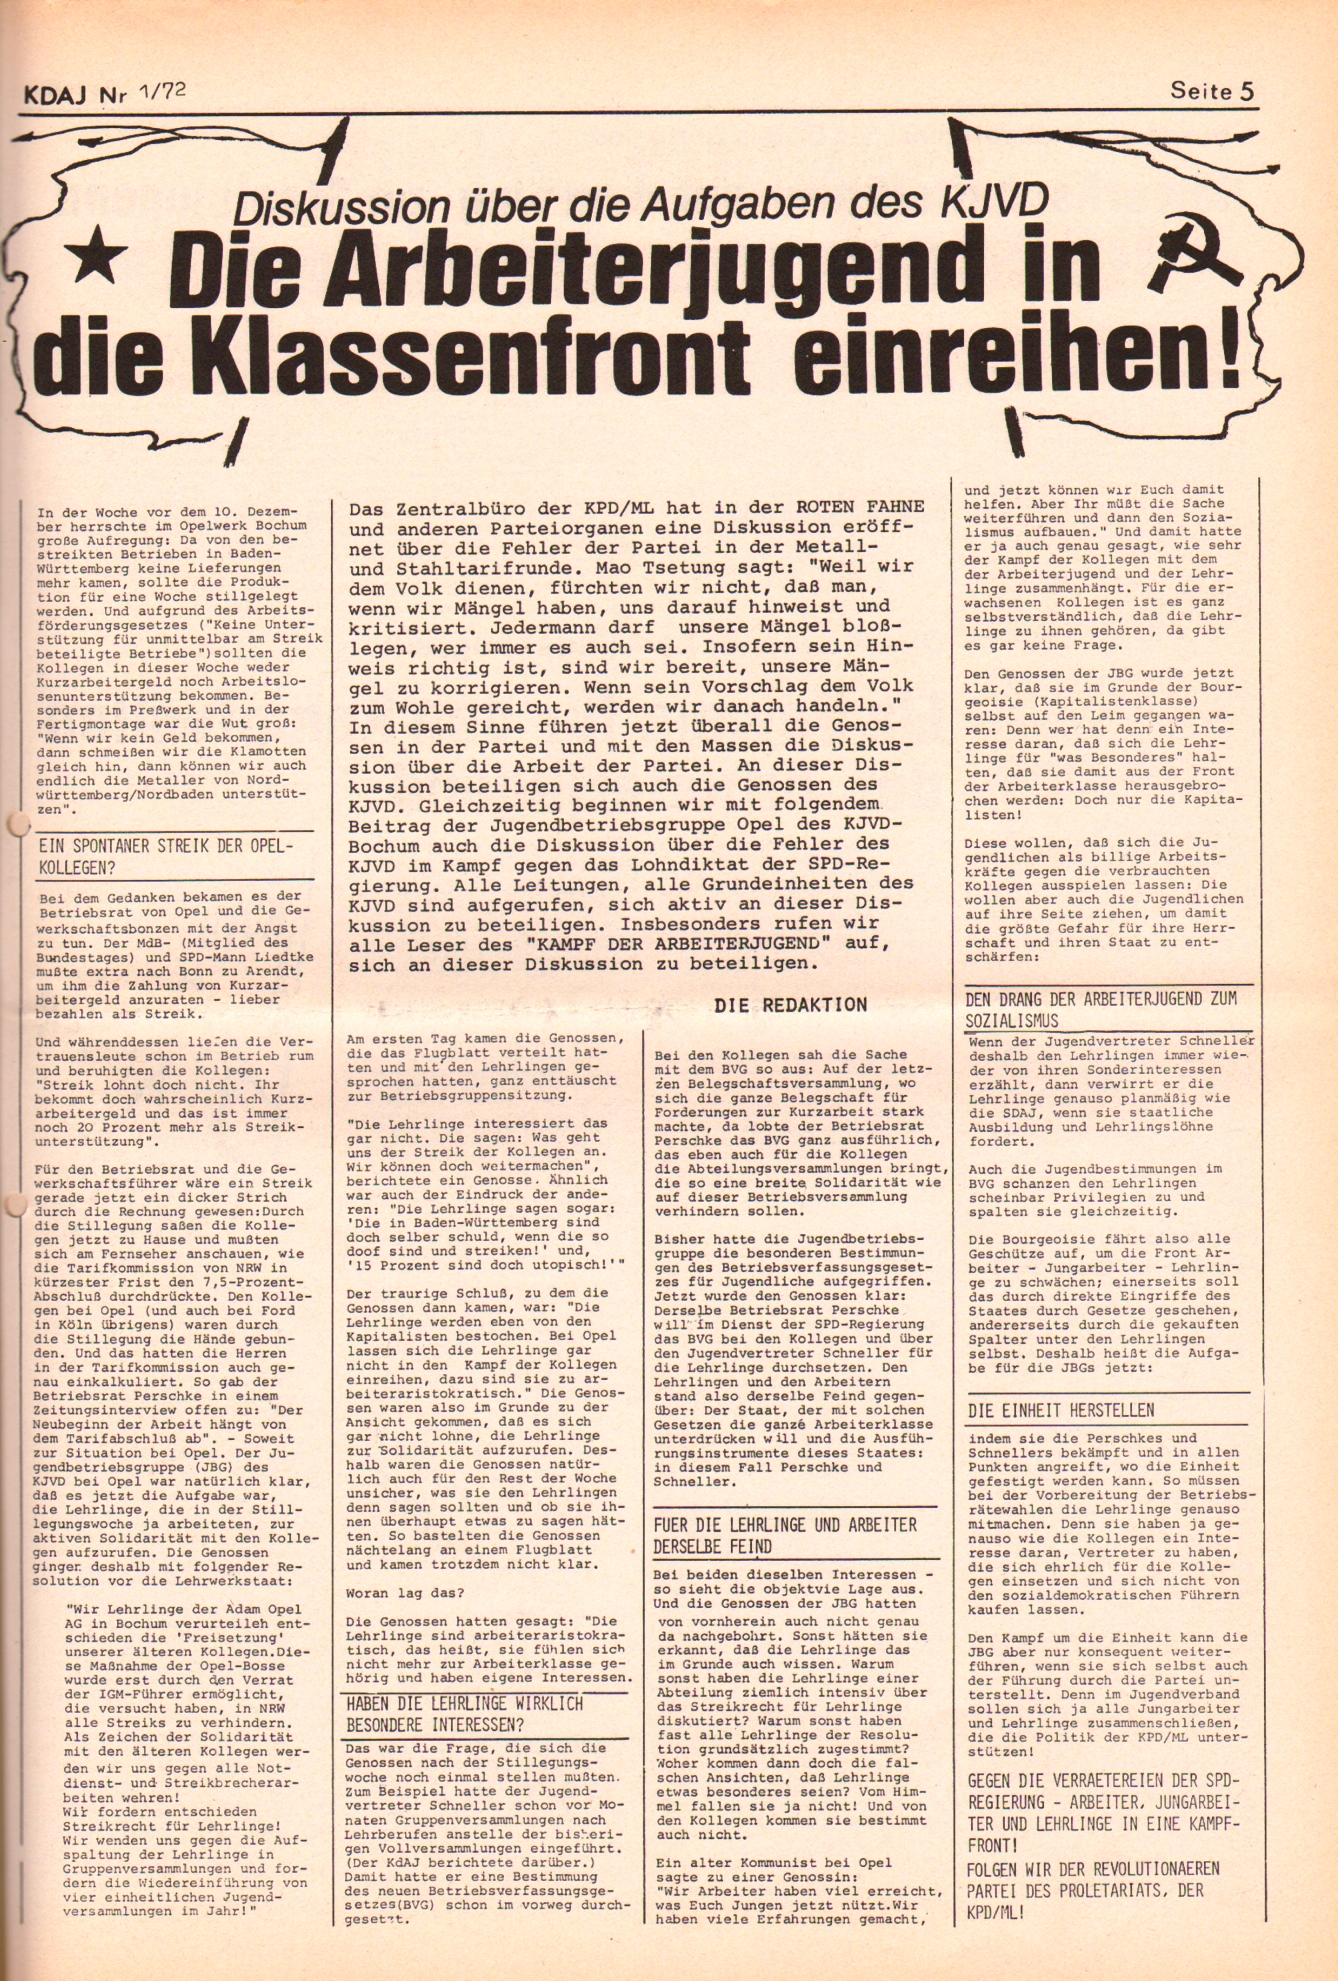 KDAJ, 3. Jg., Januar/Februar 1972, Nr. 1, Seite 5